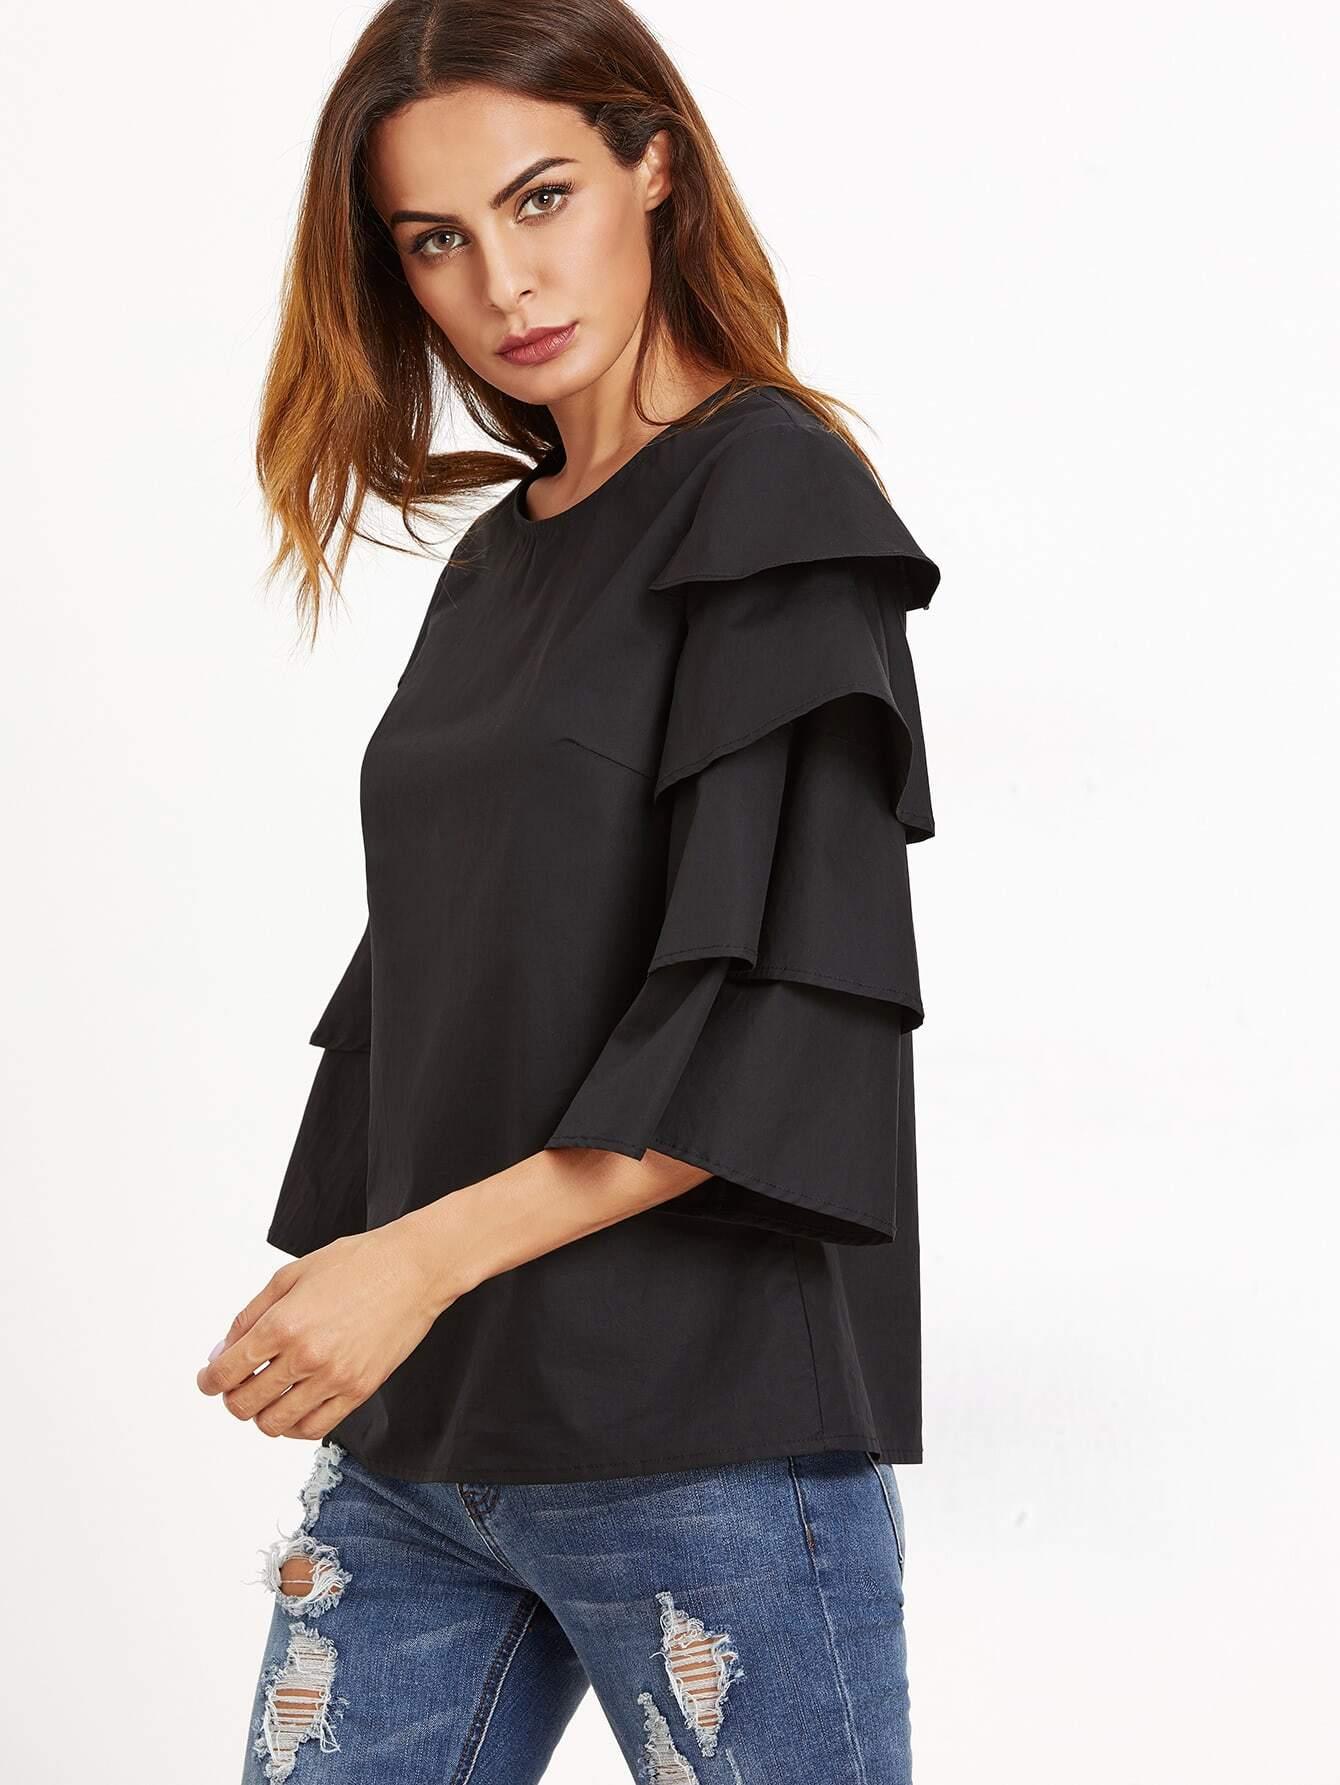 blouse161021701_2